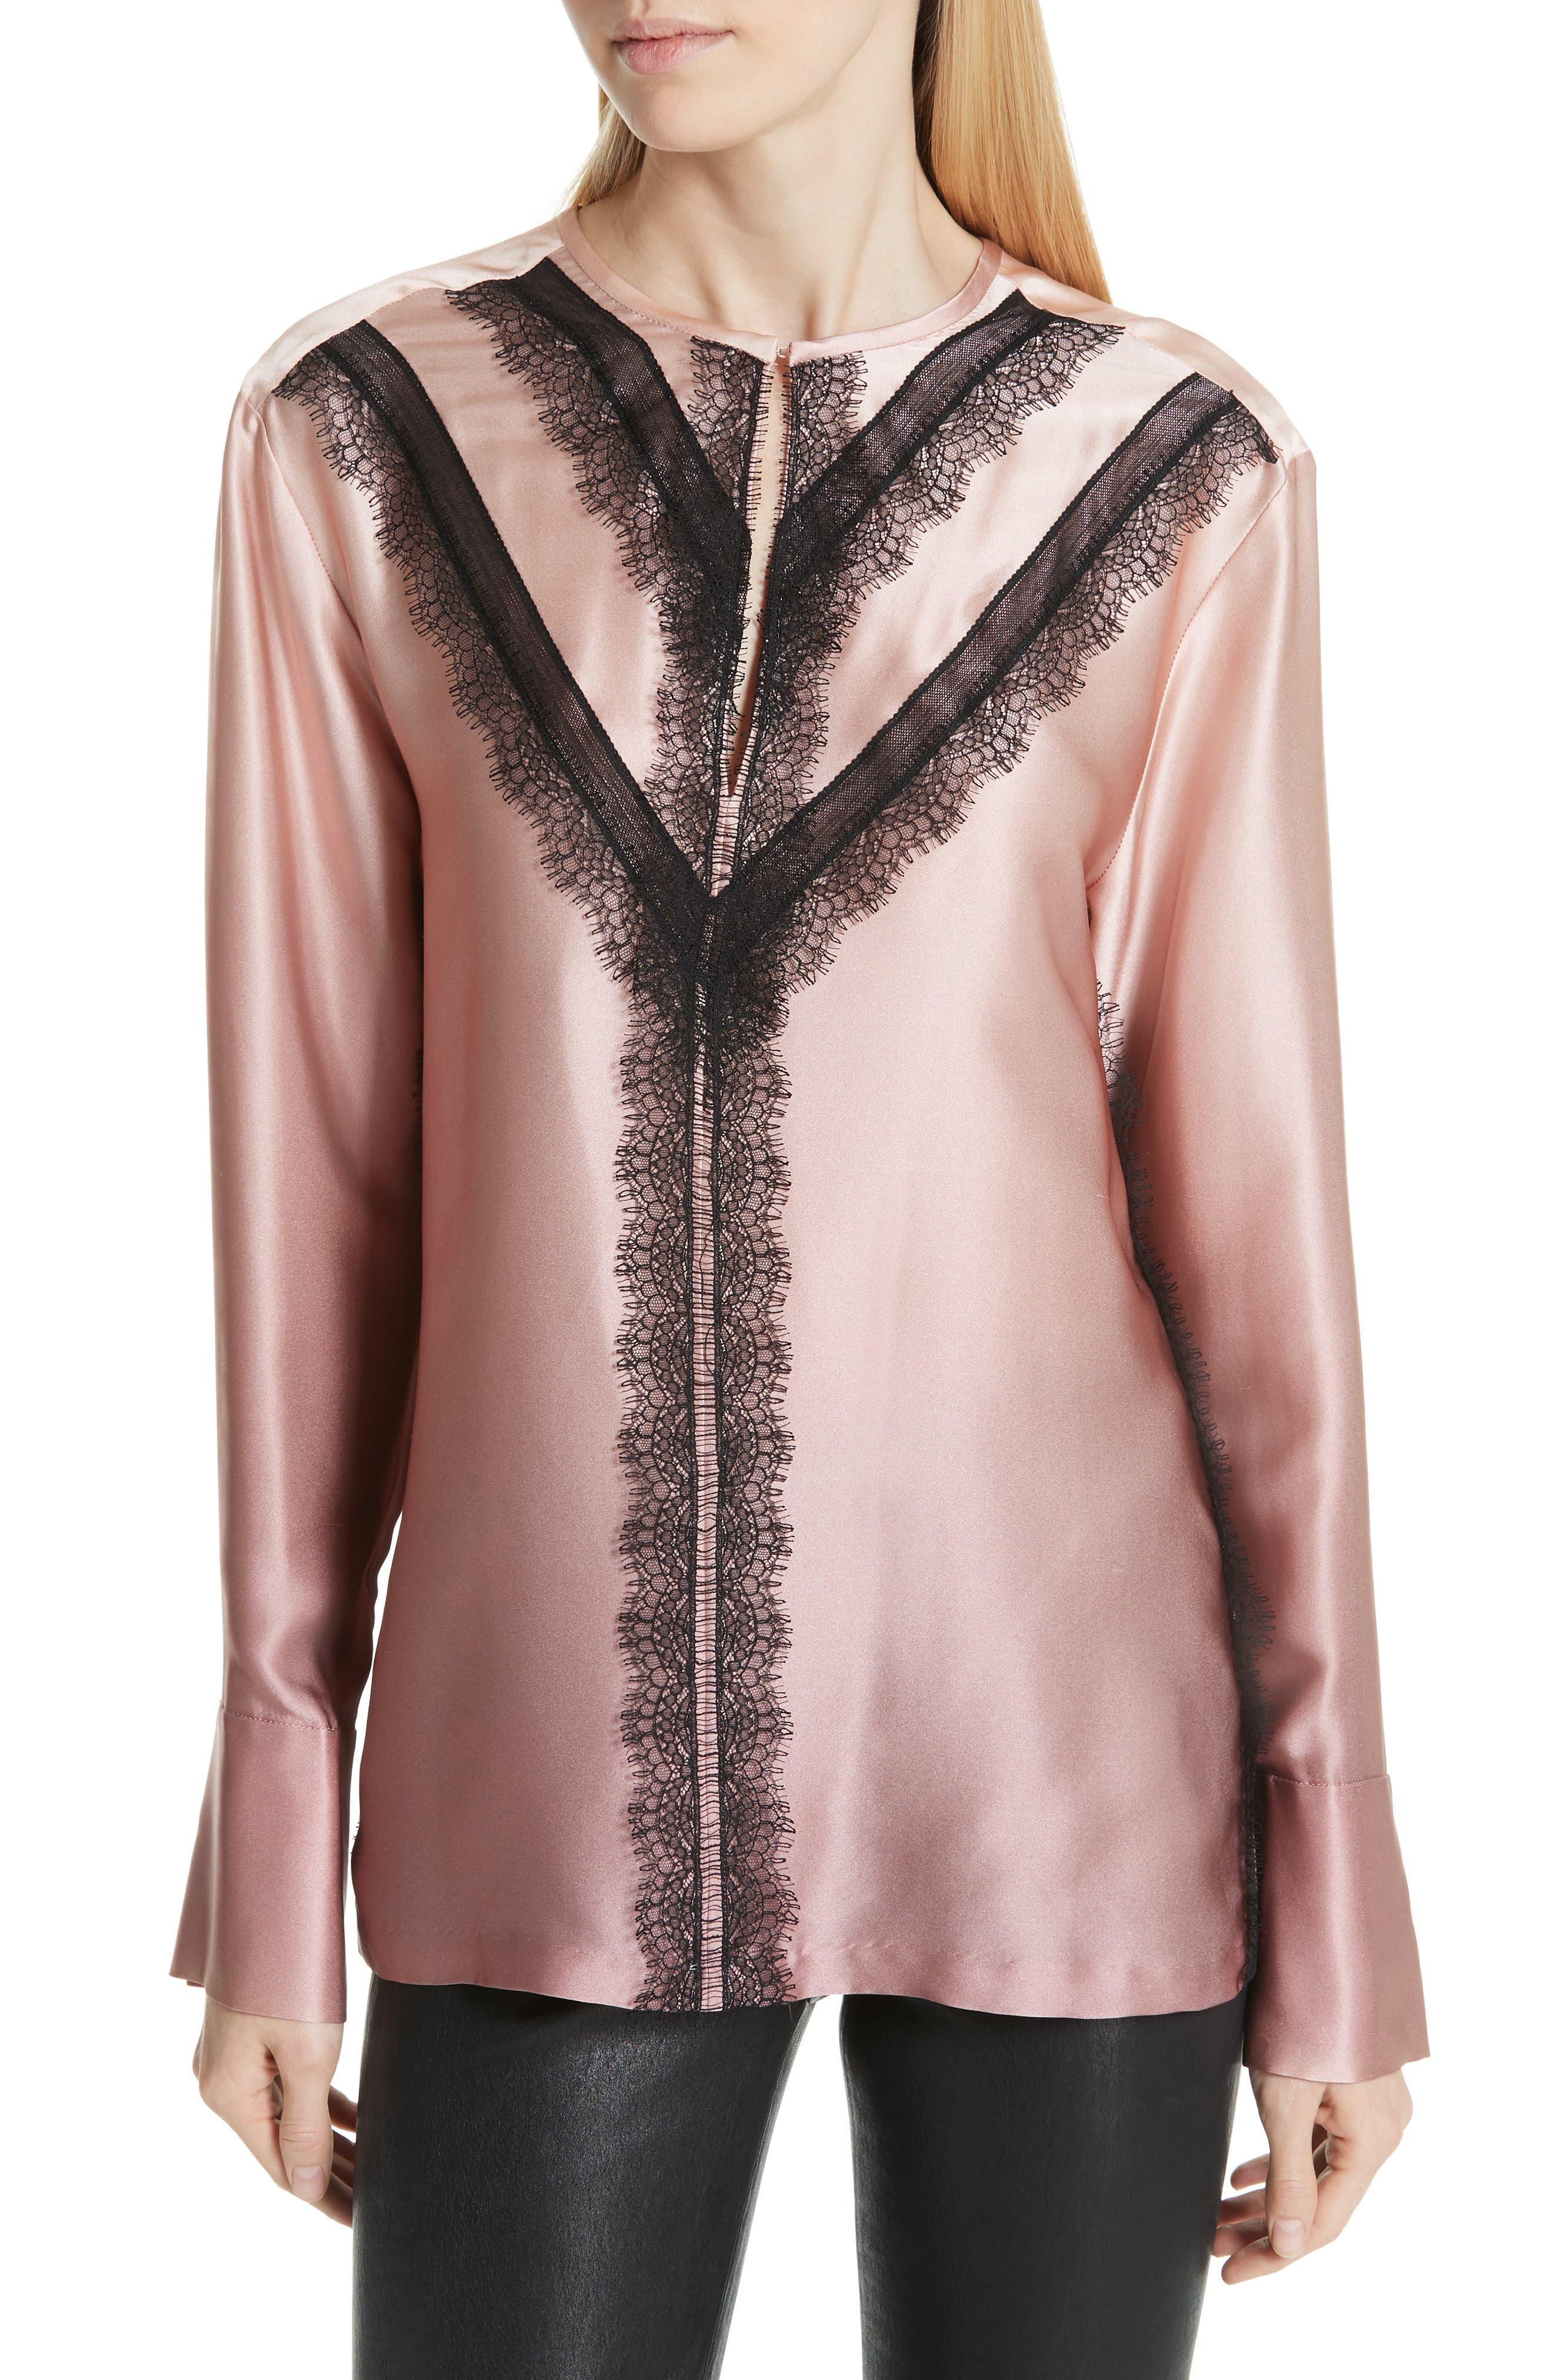 GREY Jason Wu Ombré Silk Shirt,                             Main thumbnail 1, color,                             DESERT ROSE